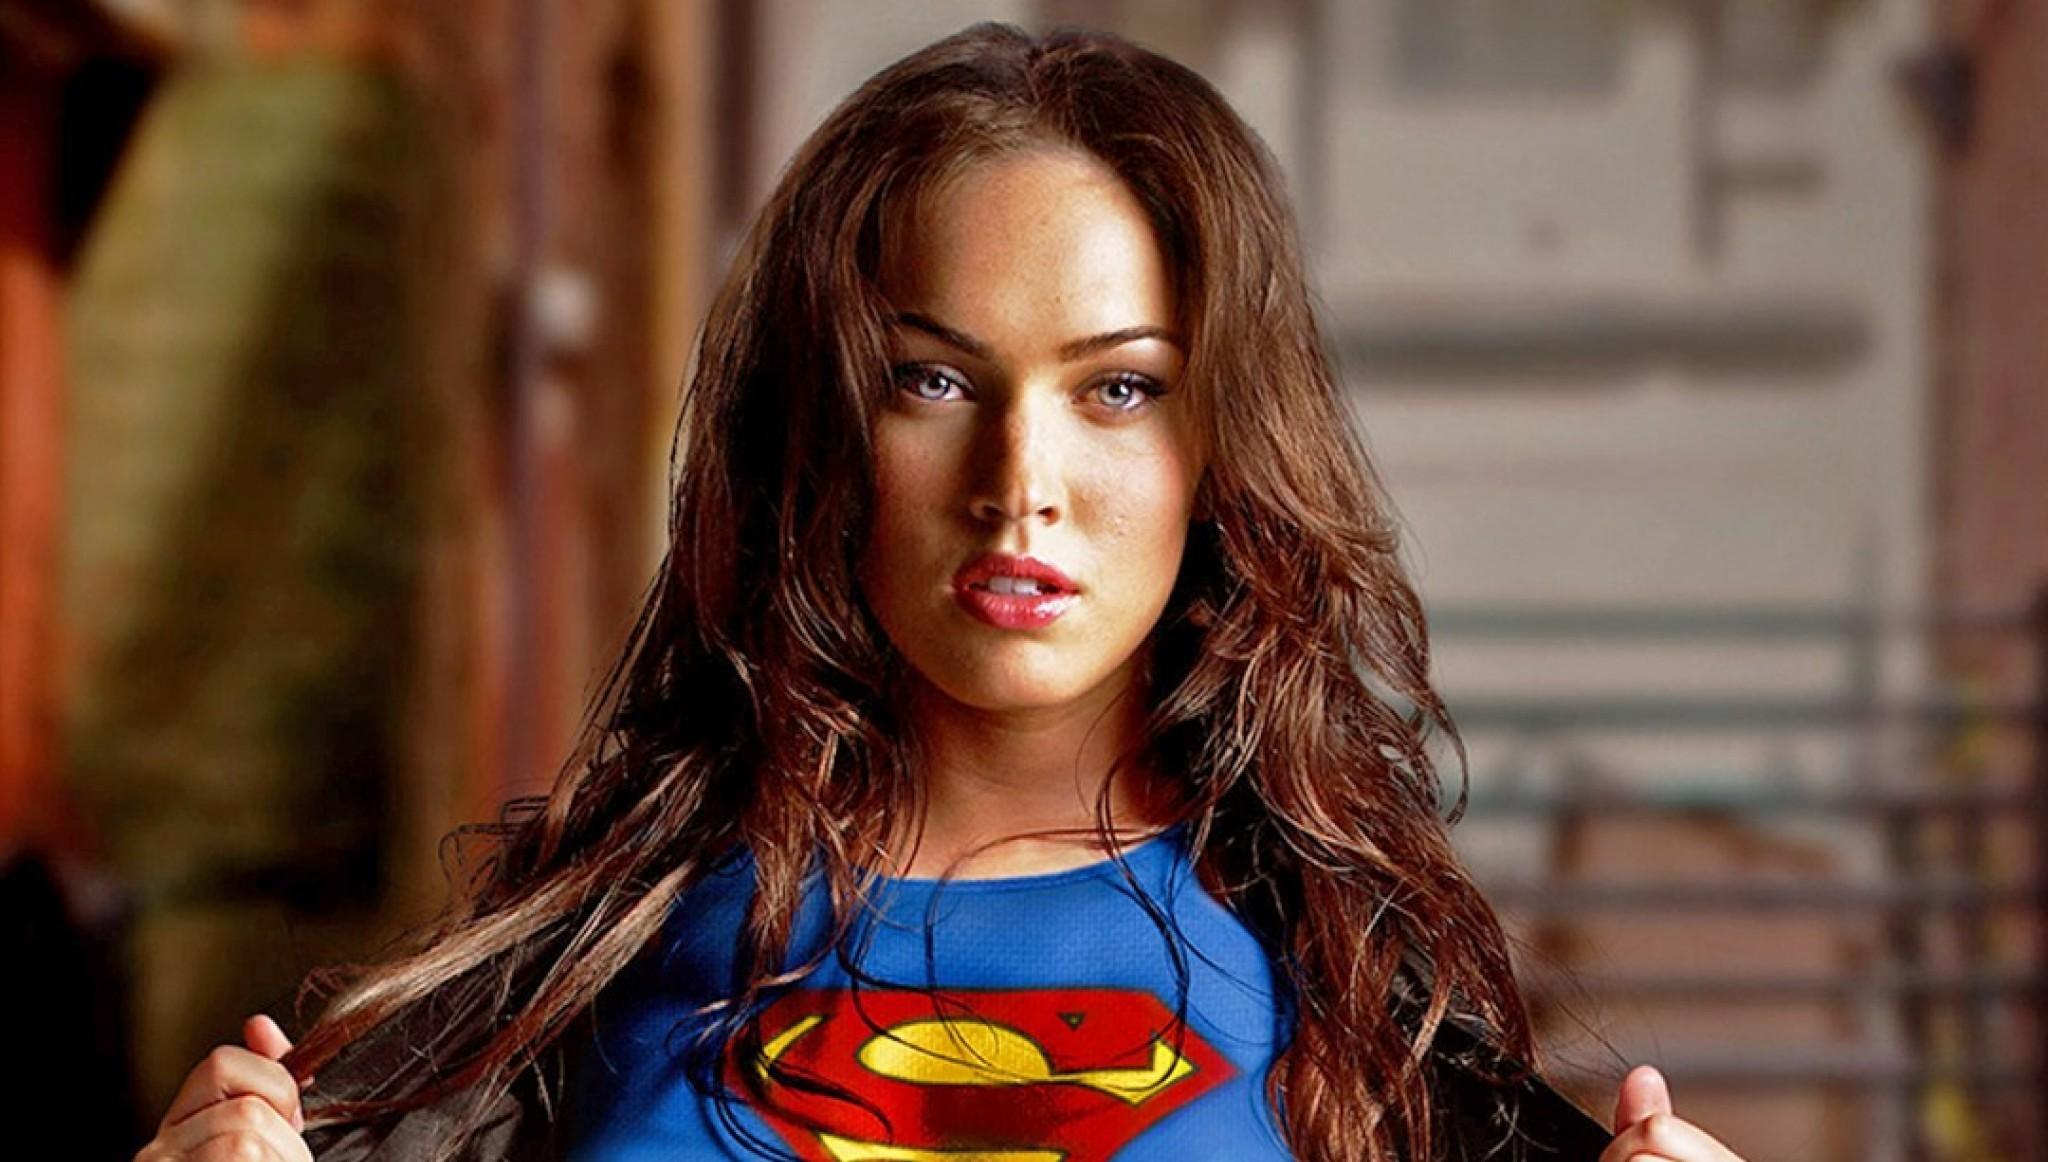 Megan Fox Supergirl Wallpaper 45 Images